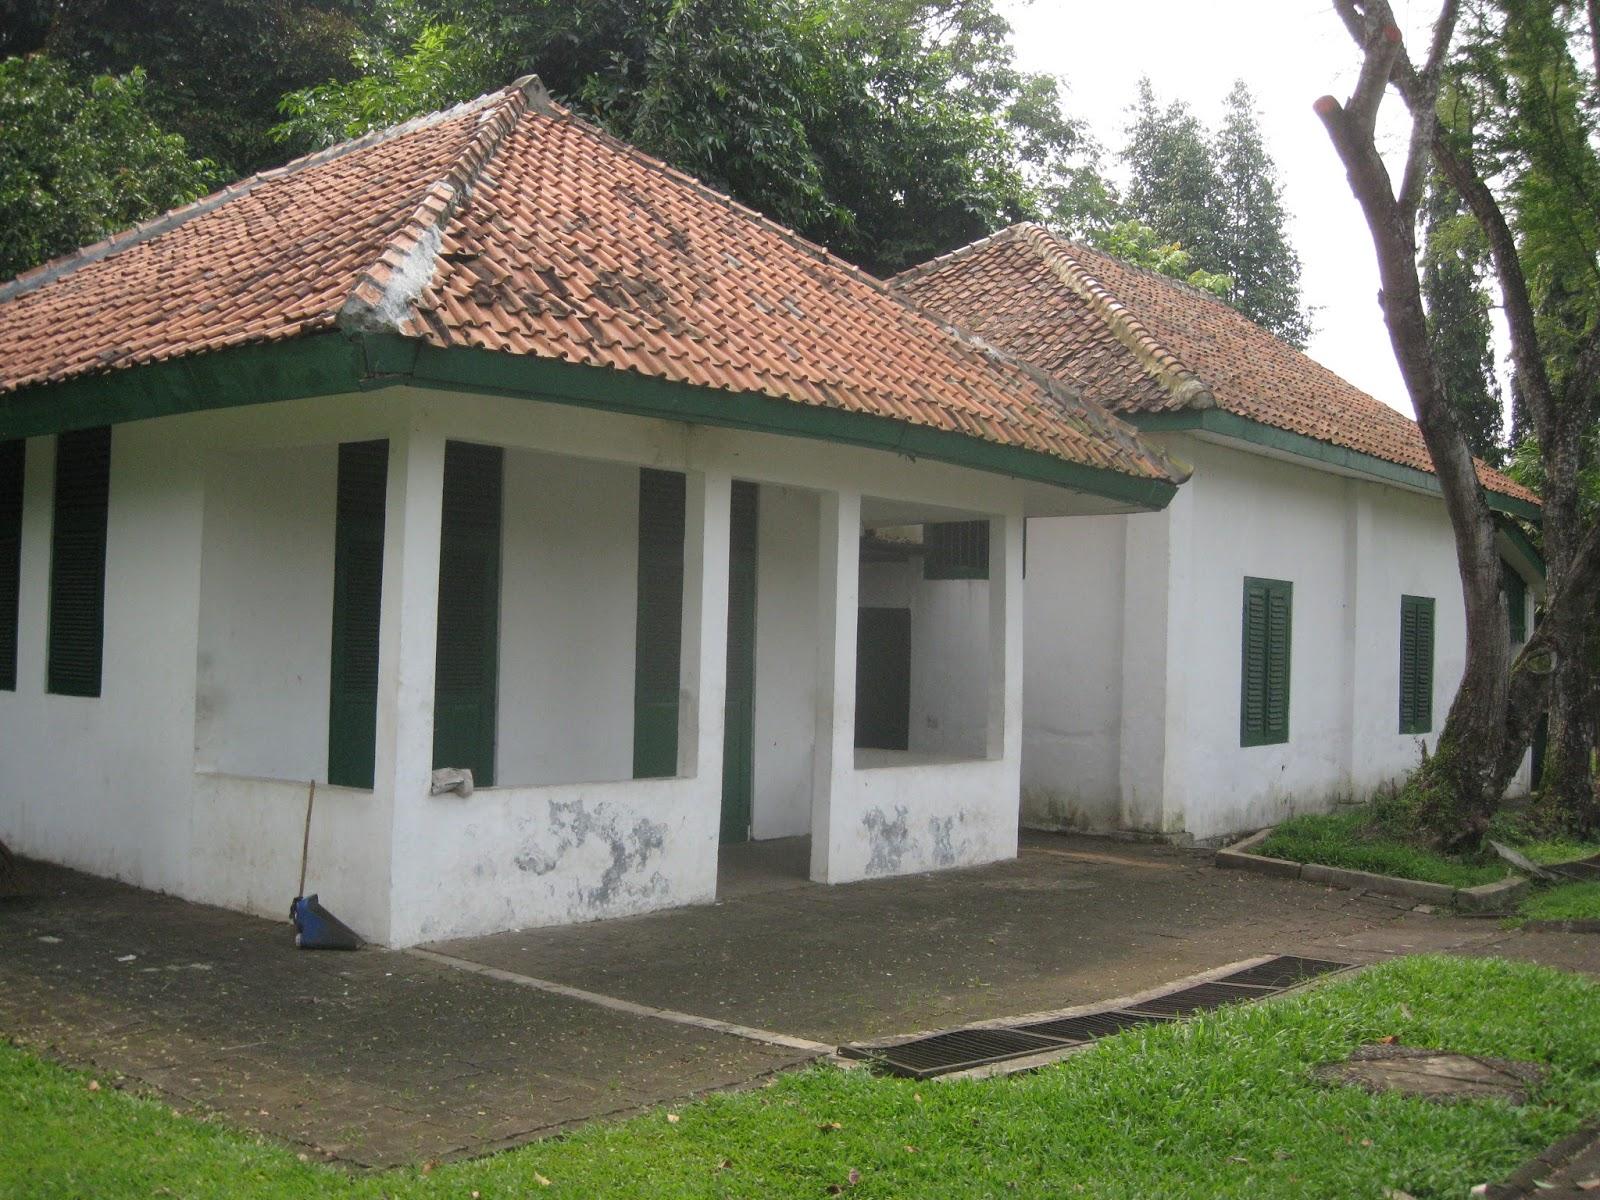 Letsgo2museum Monumen Palagan Lengkong Serpong Peristiwa Bagian Belakang Rumah Musium